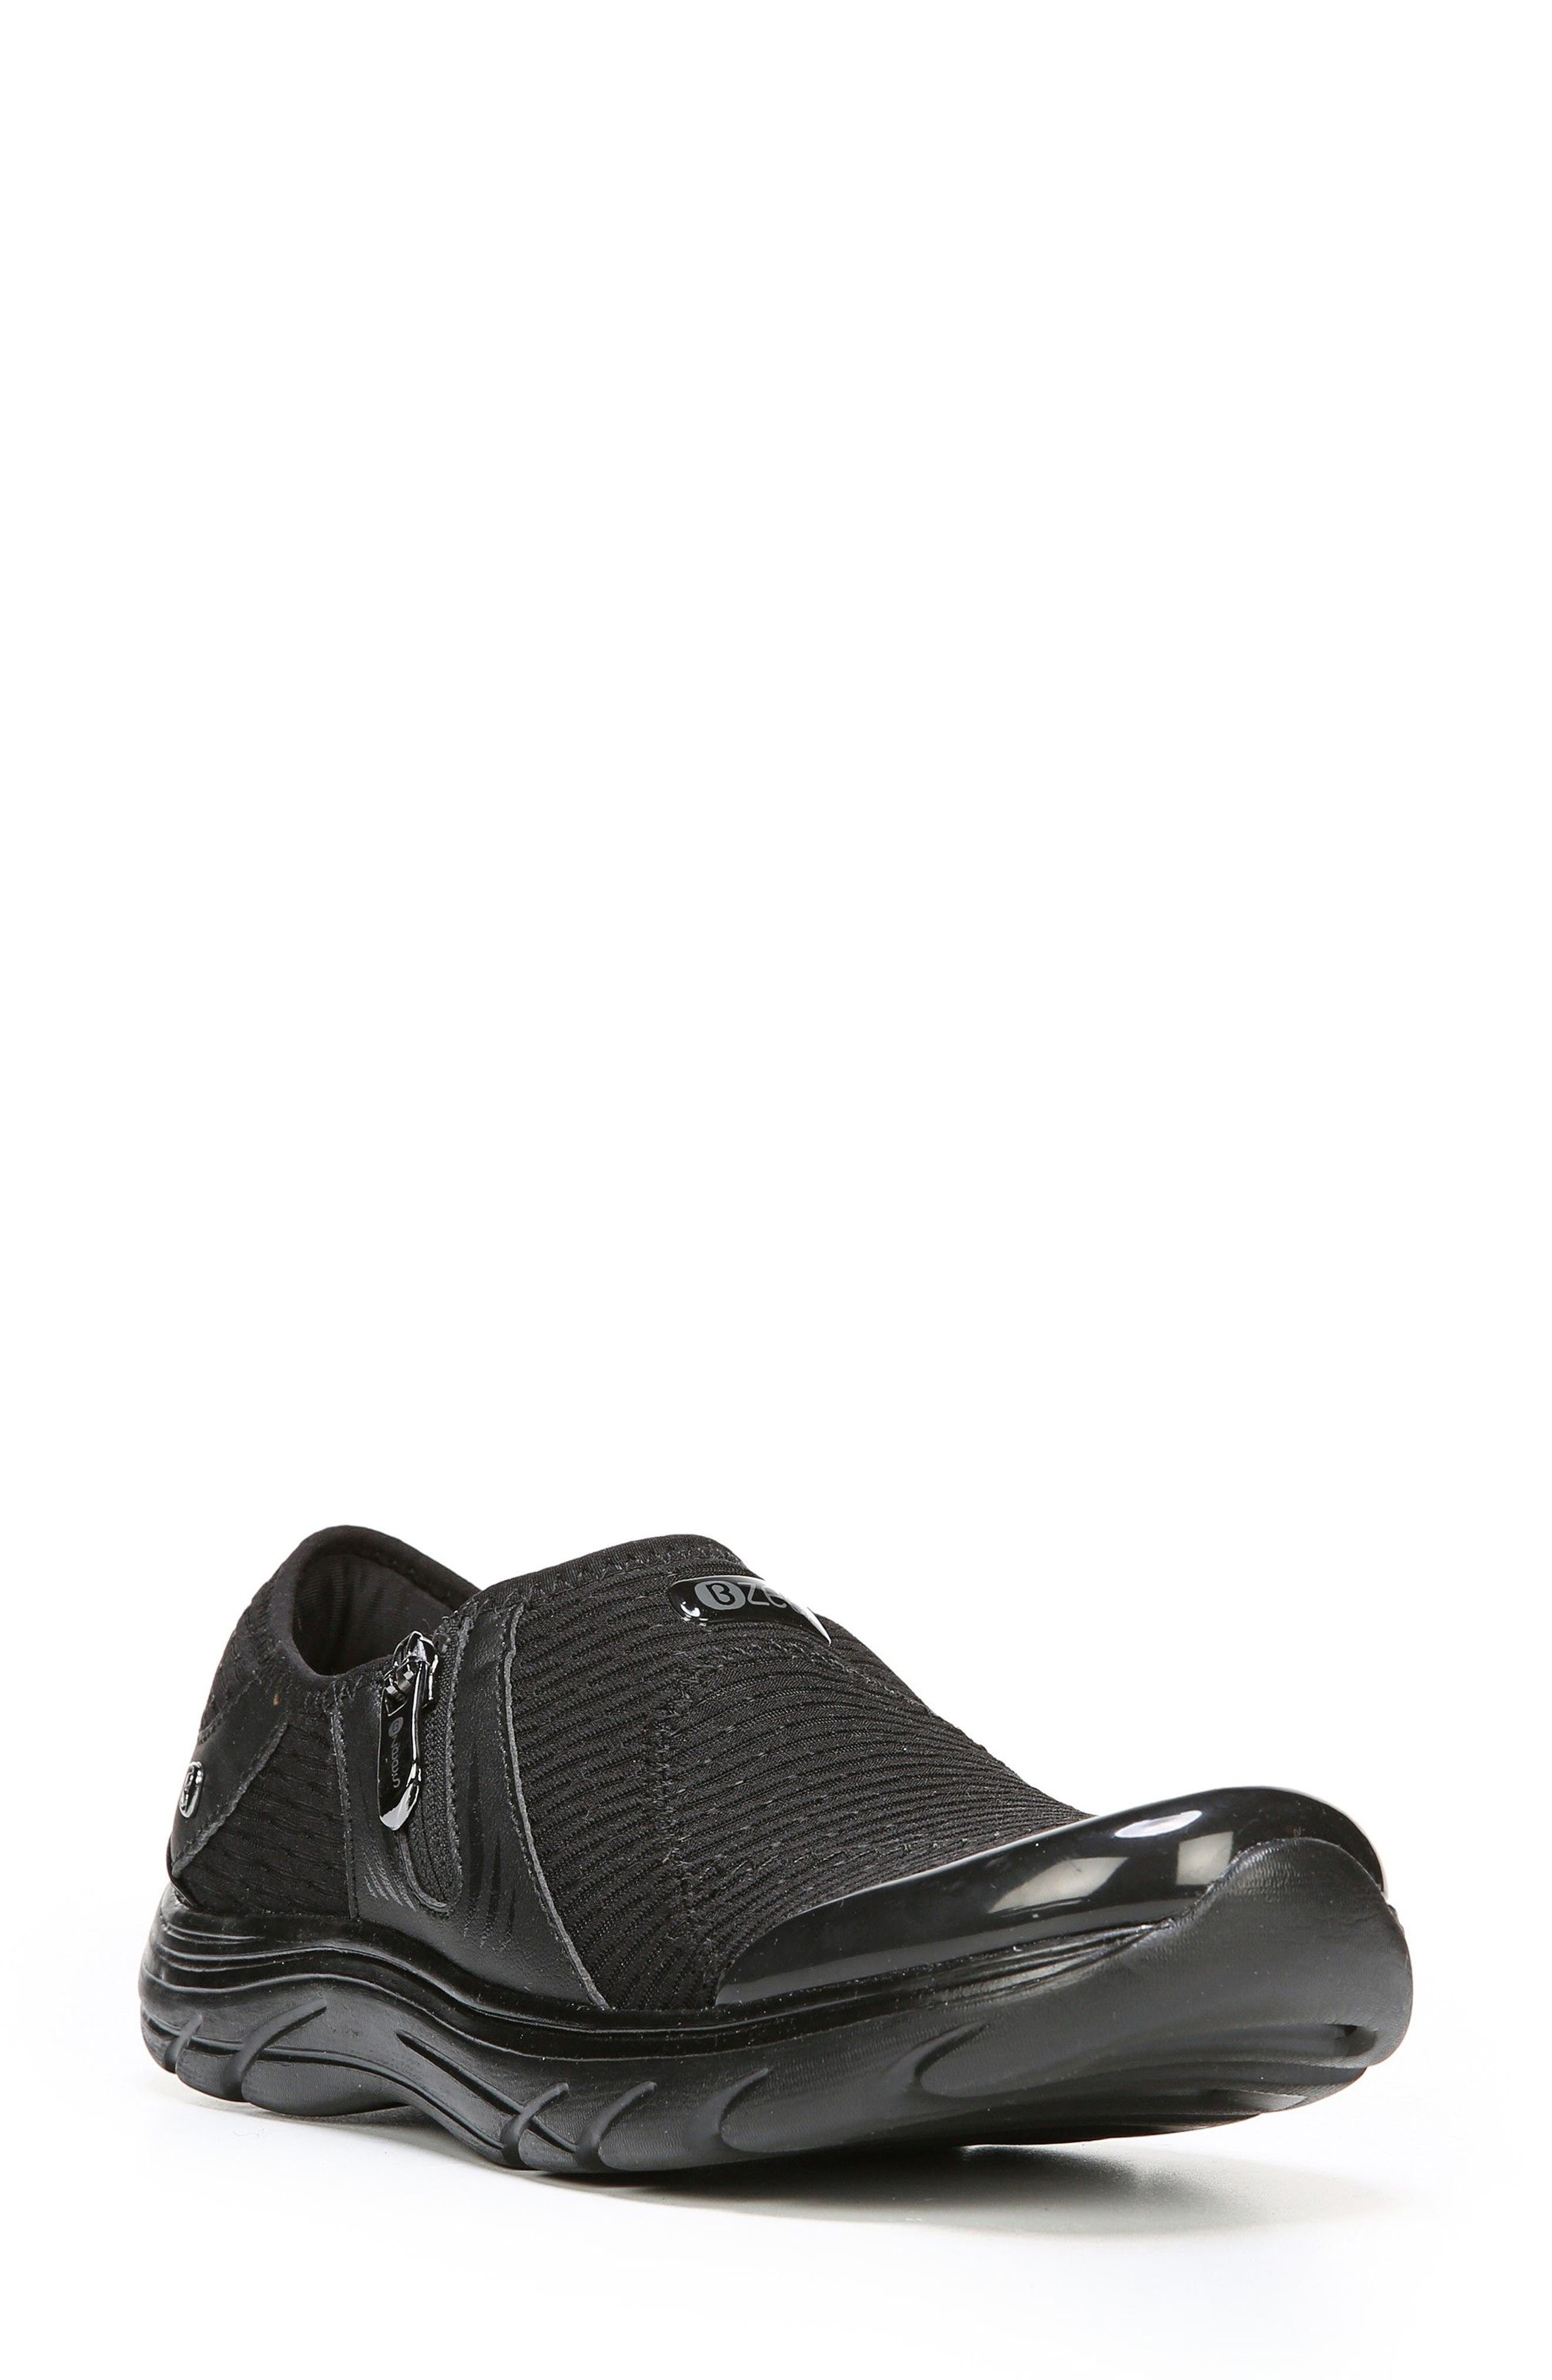 Balance Sneaker,                         Main,                         color,